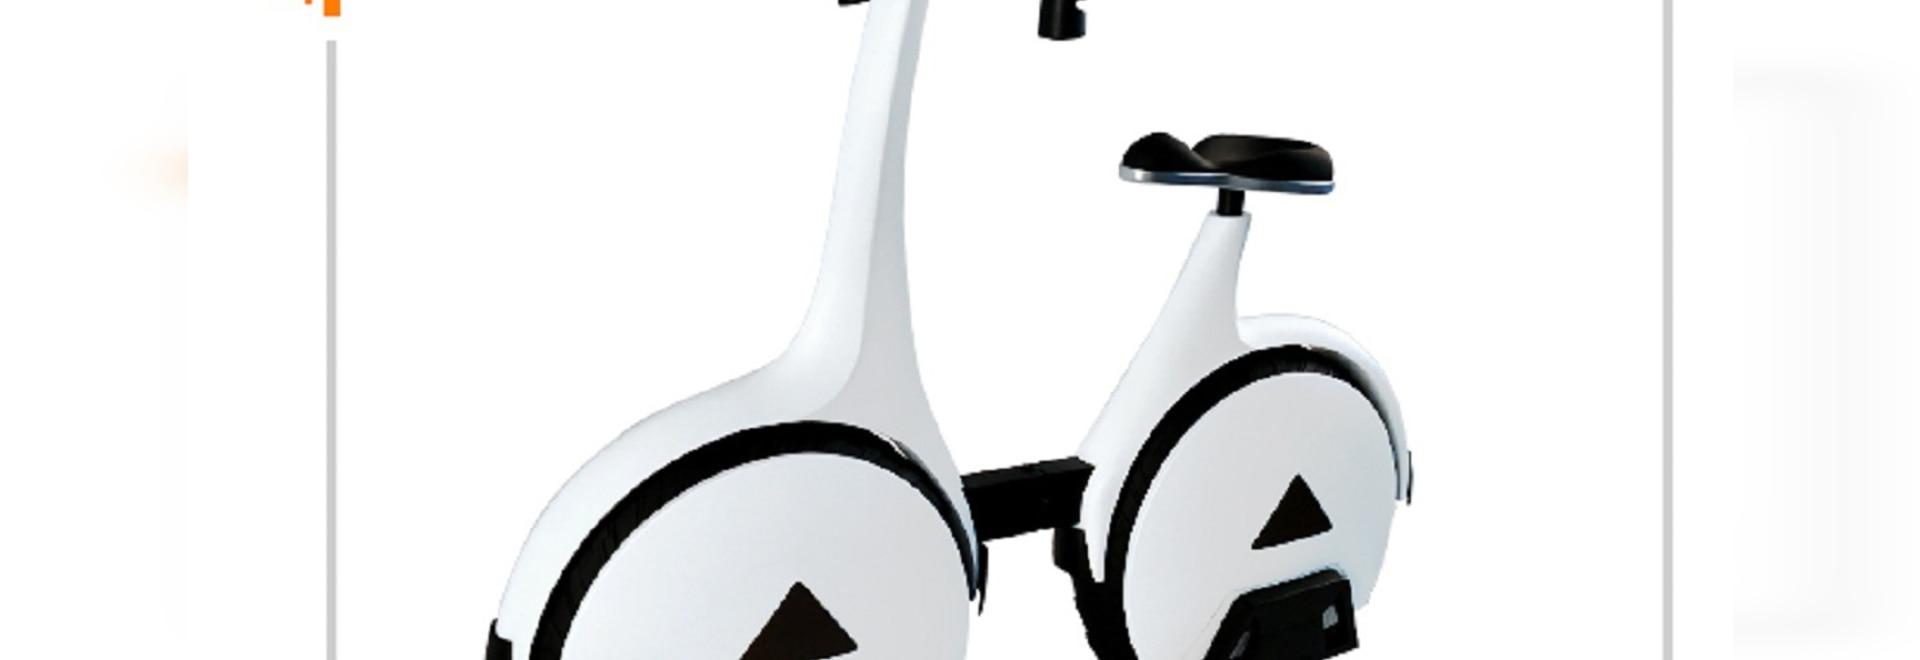 Bi-Uni Convertible SLA 3D Printing Bicycle